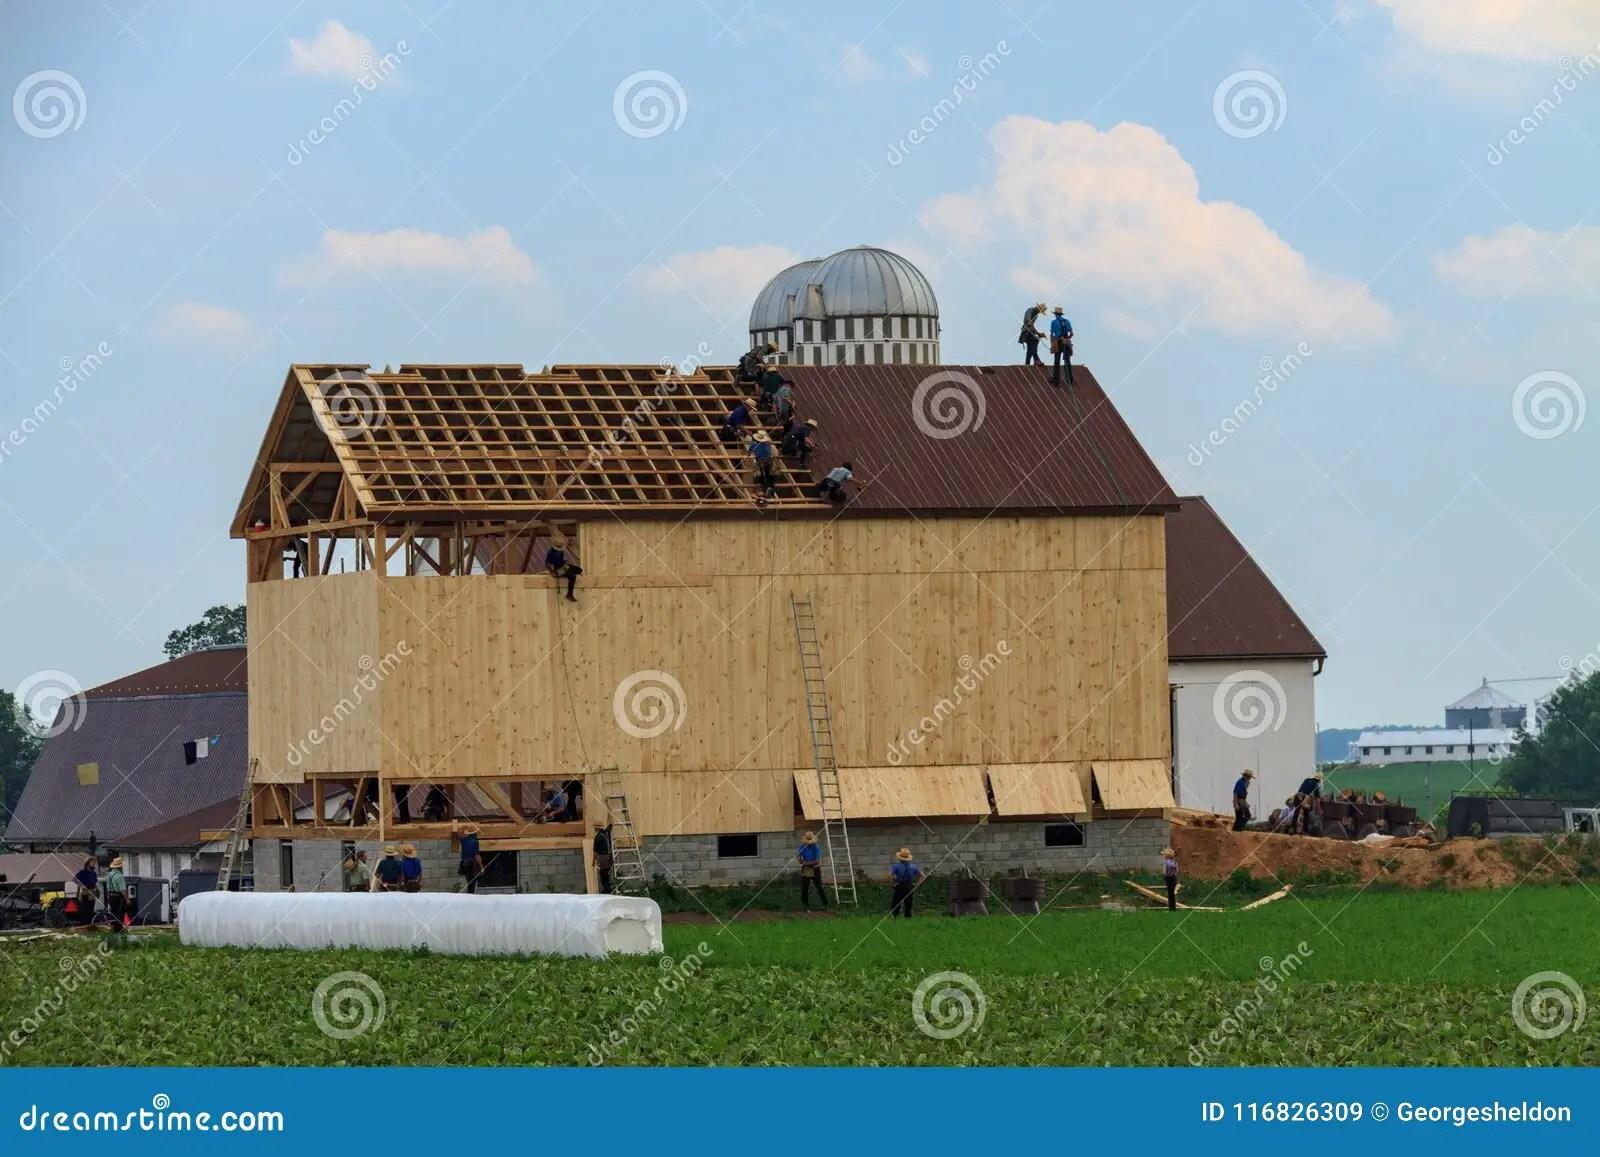 amish build a barn